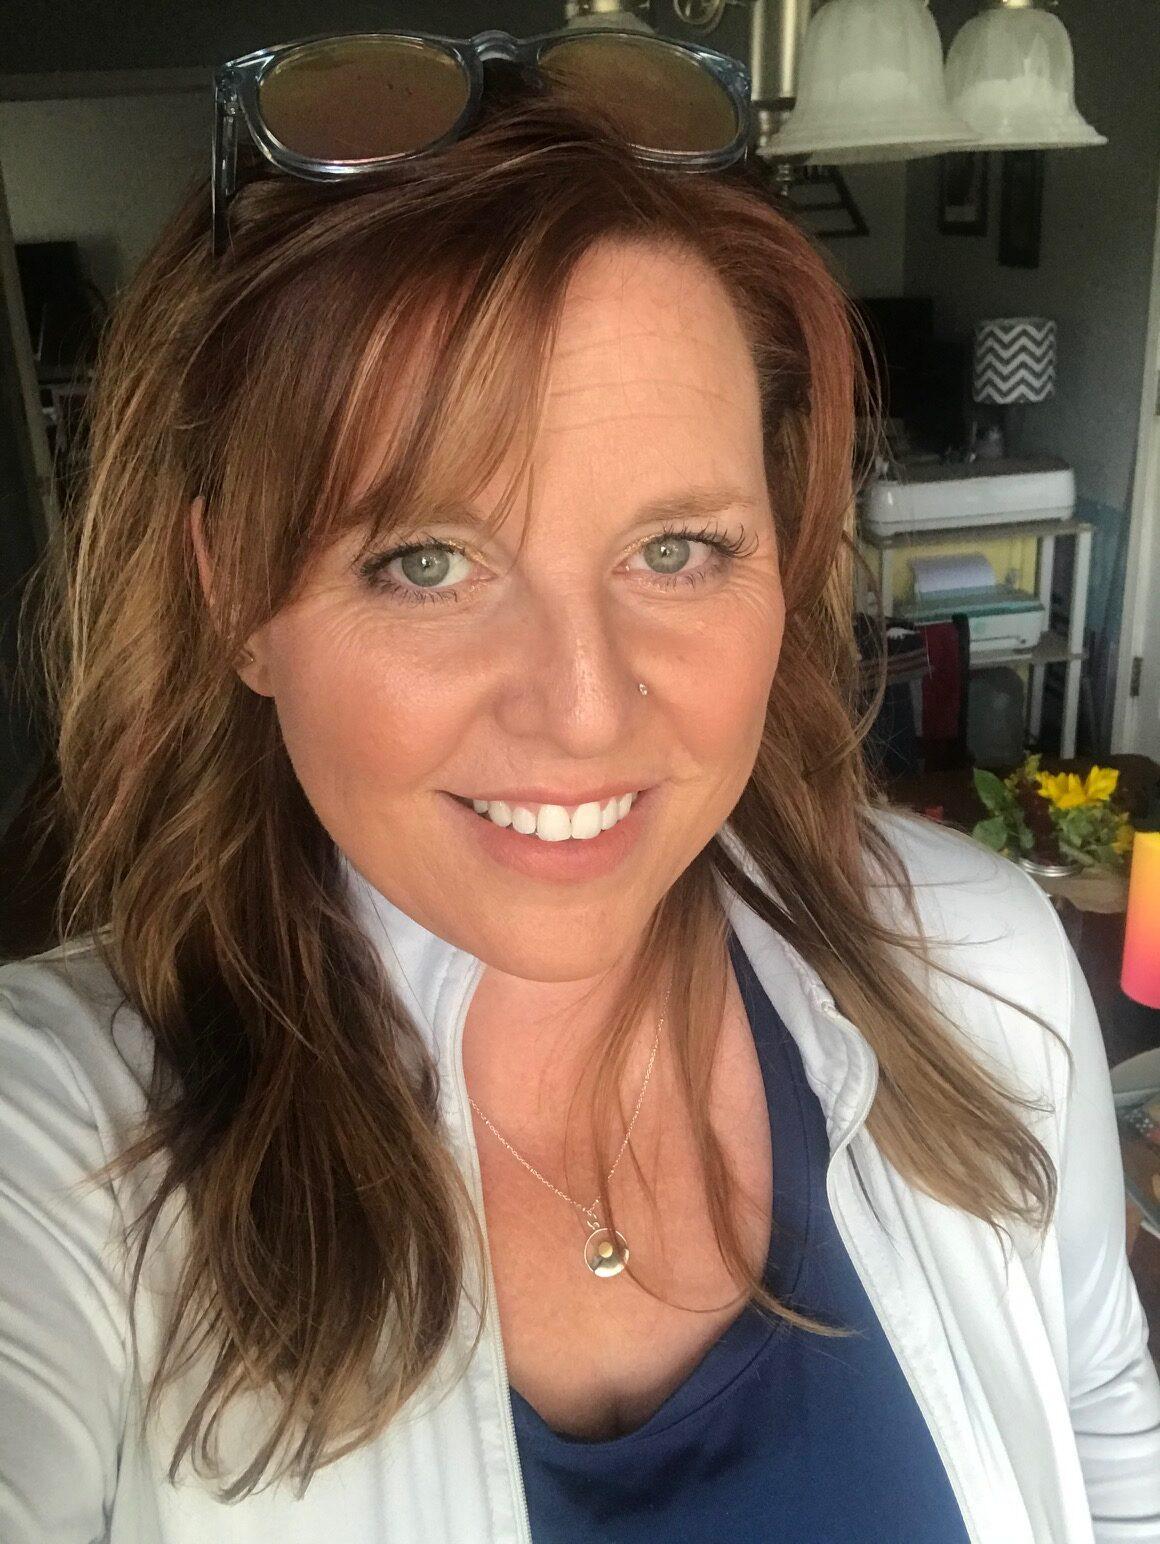 Pic of Nikki Ellerman